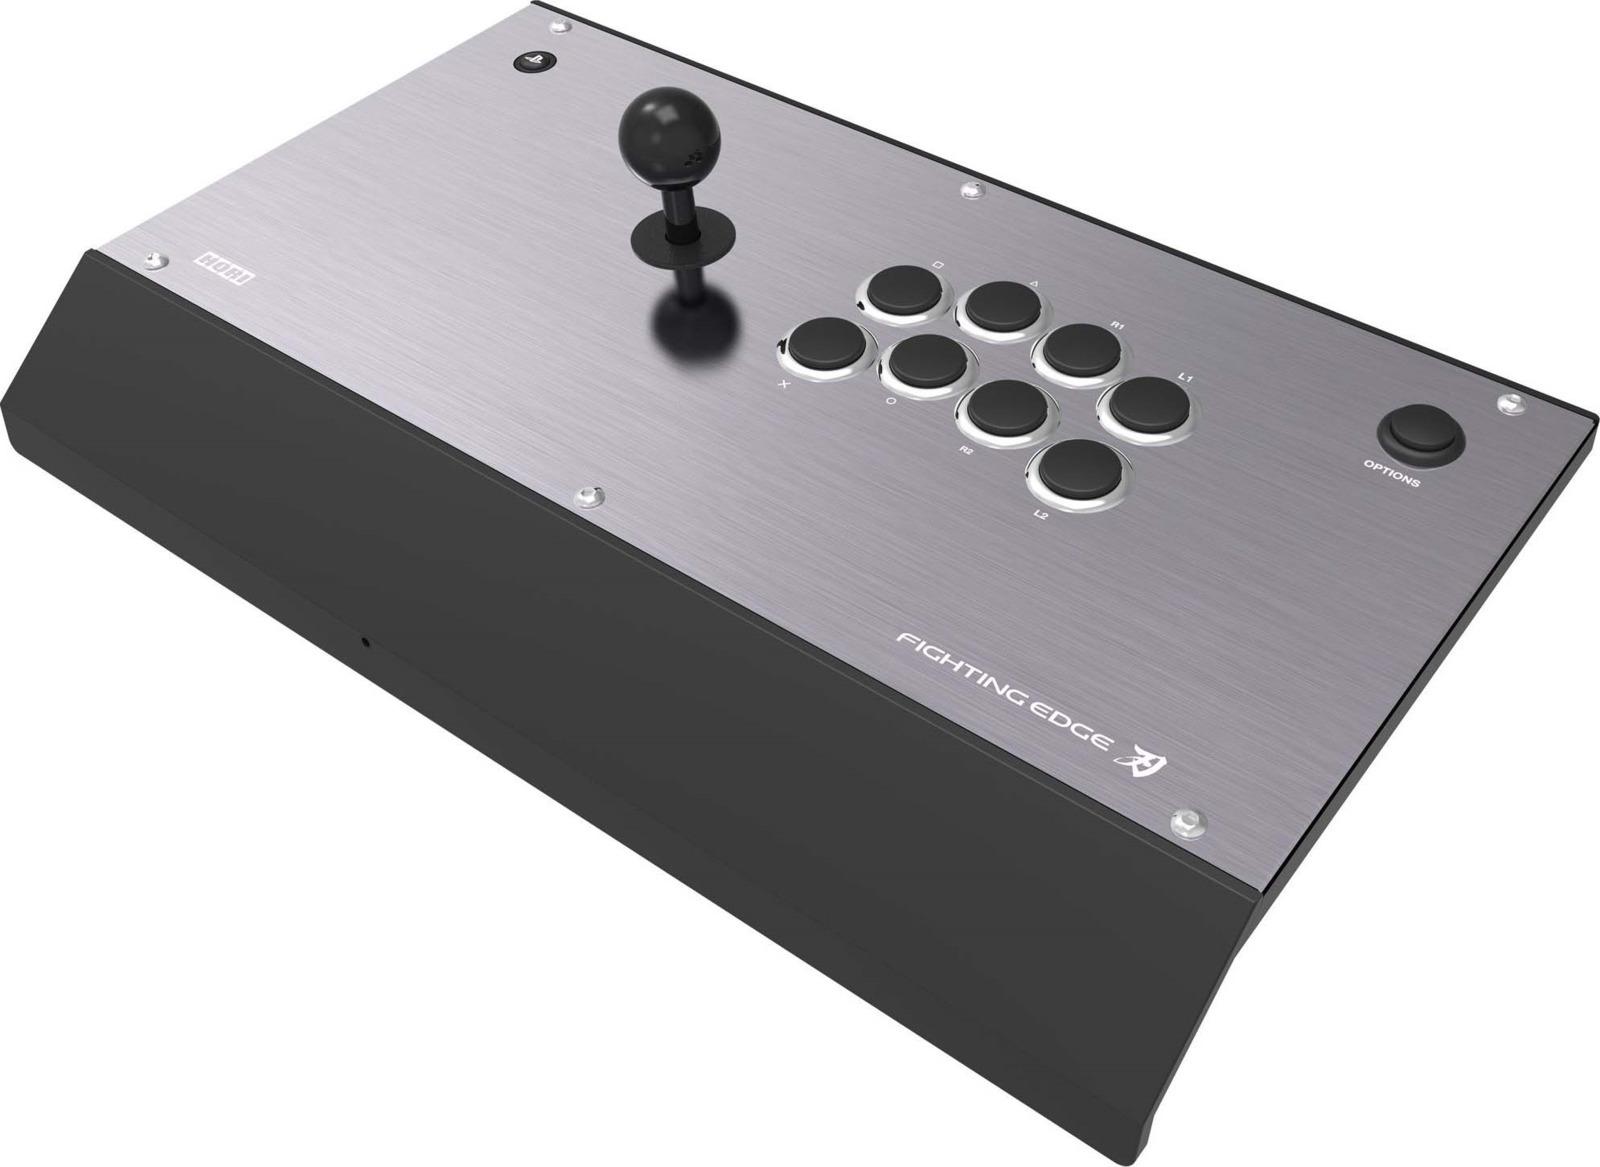 Аркадный контроллер Hori Fighting Edge для PS4/PC hori real arcade pro n hayabusa for playstation 4